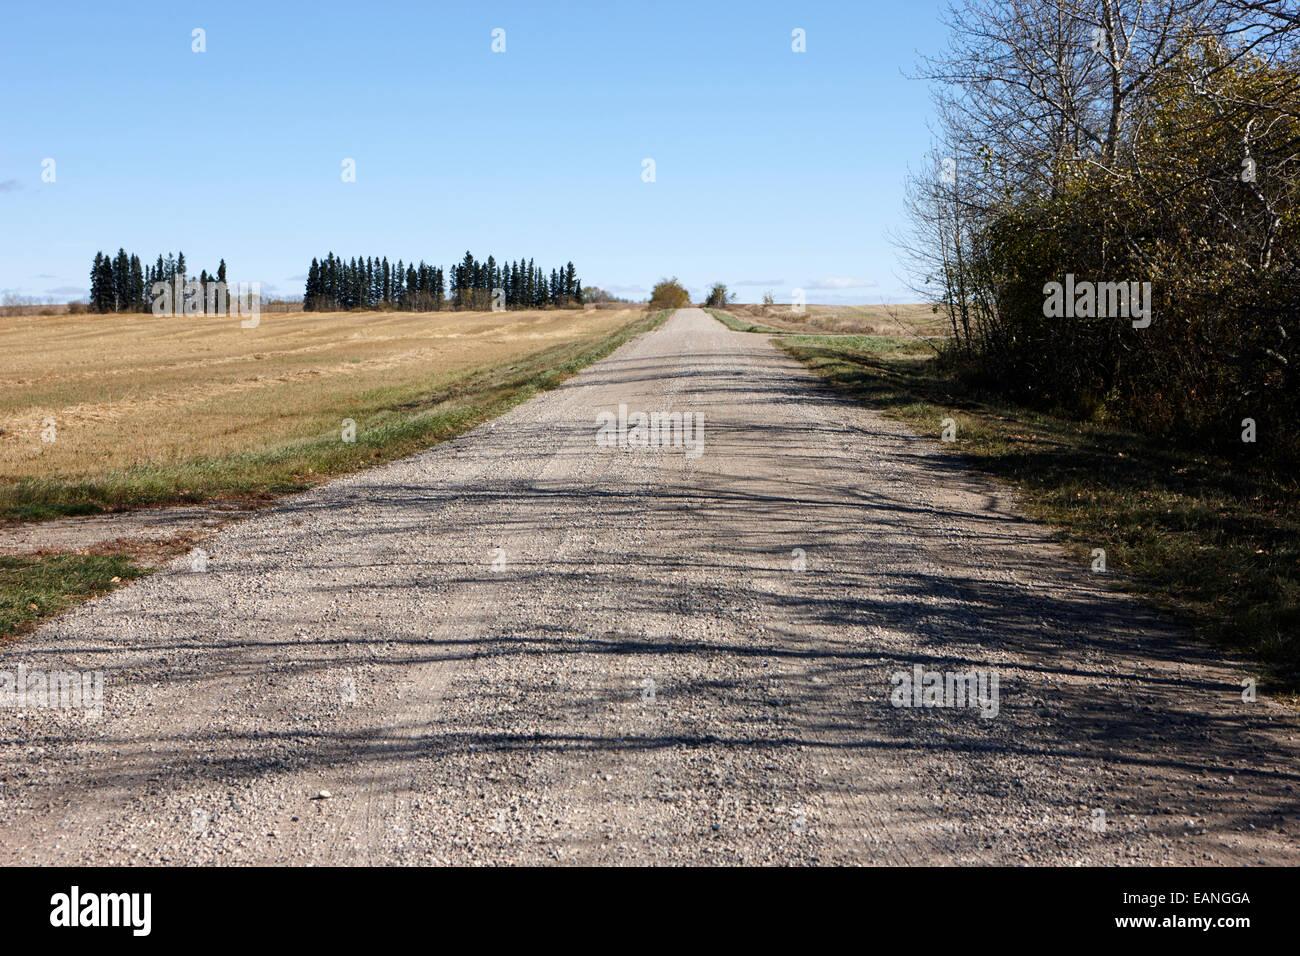 rough rural unpaved gravel road in remote Saskatchewan Canada - Stock Image